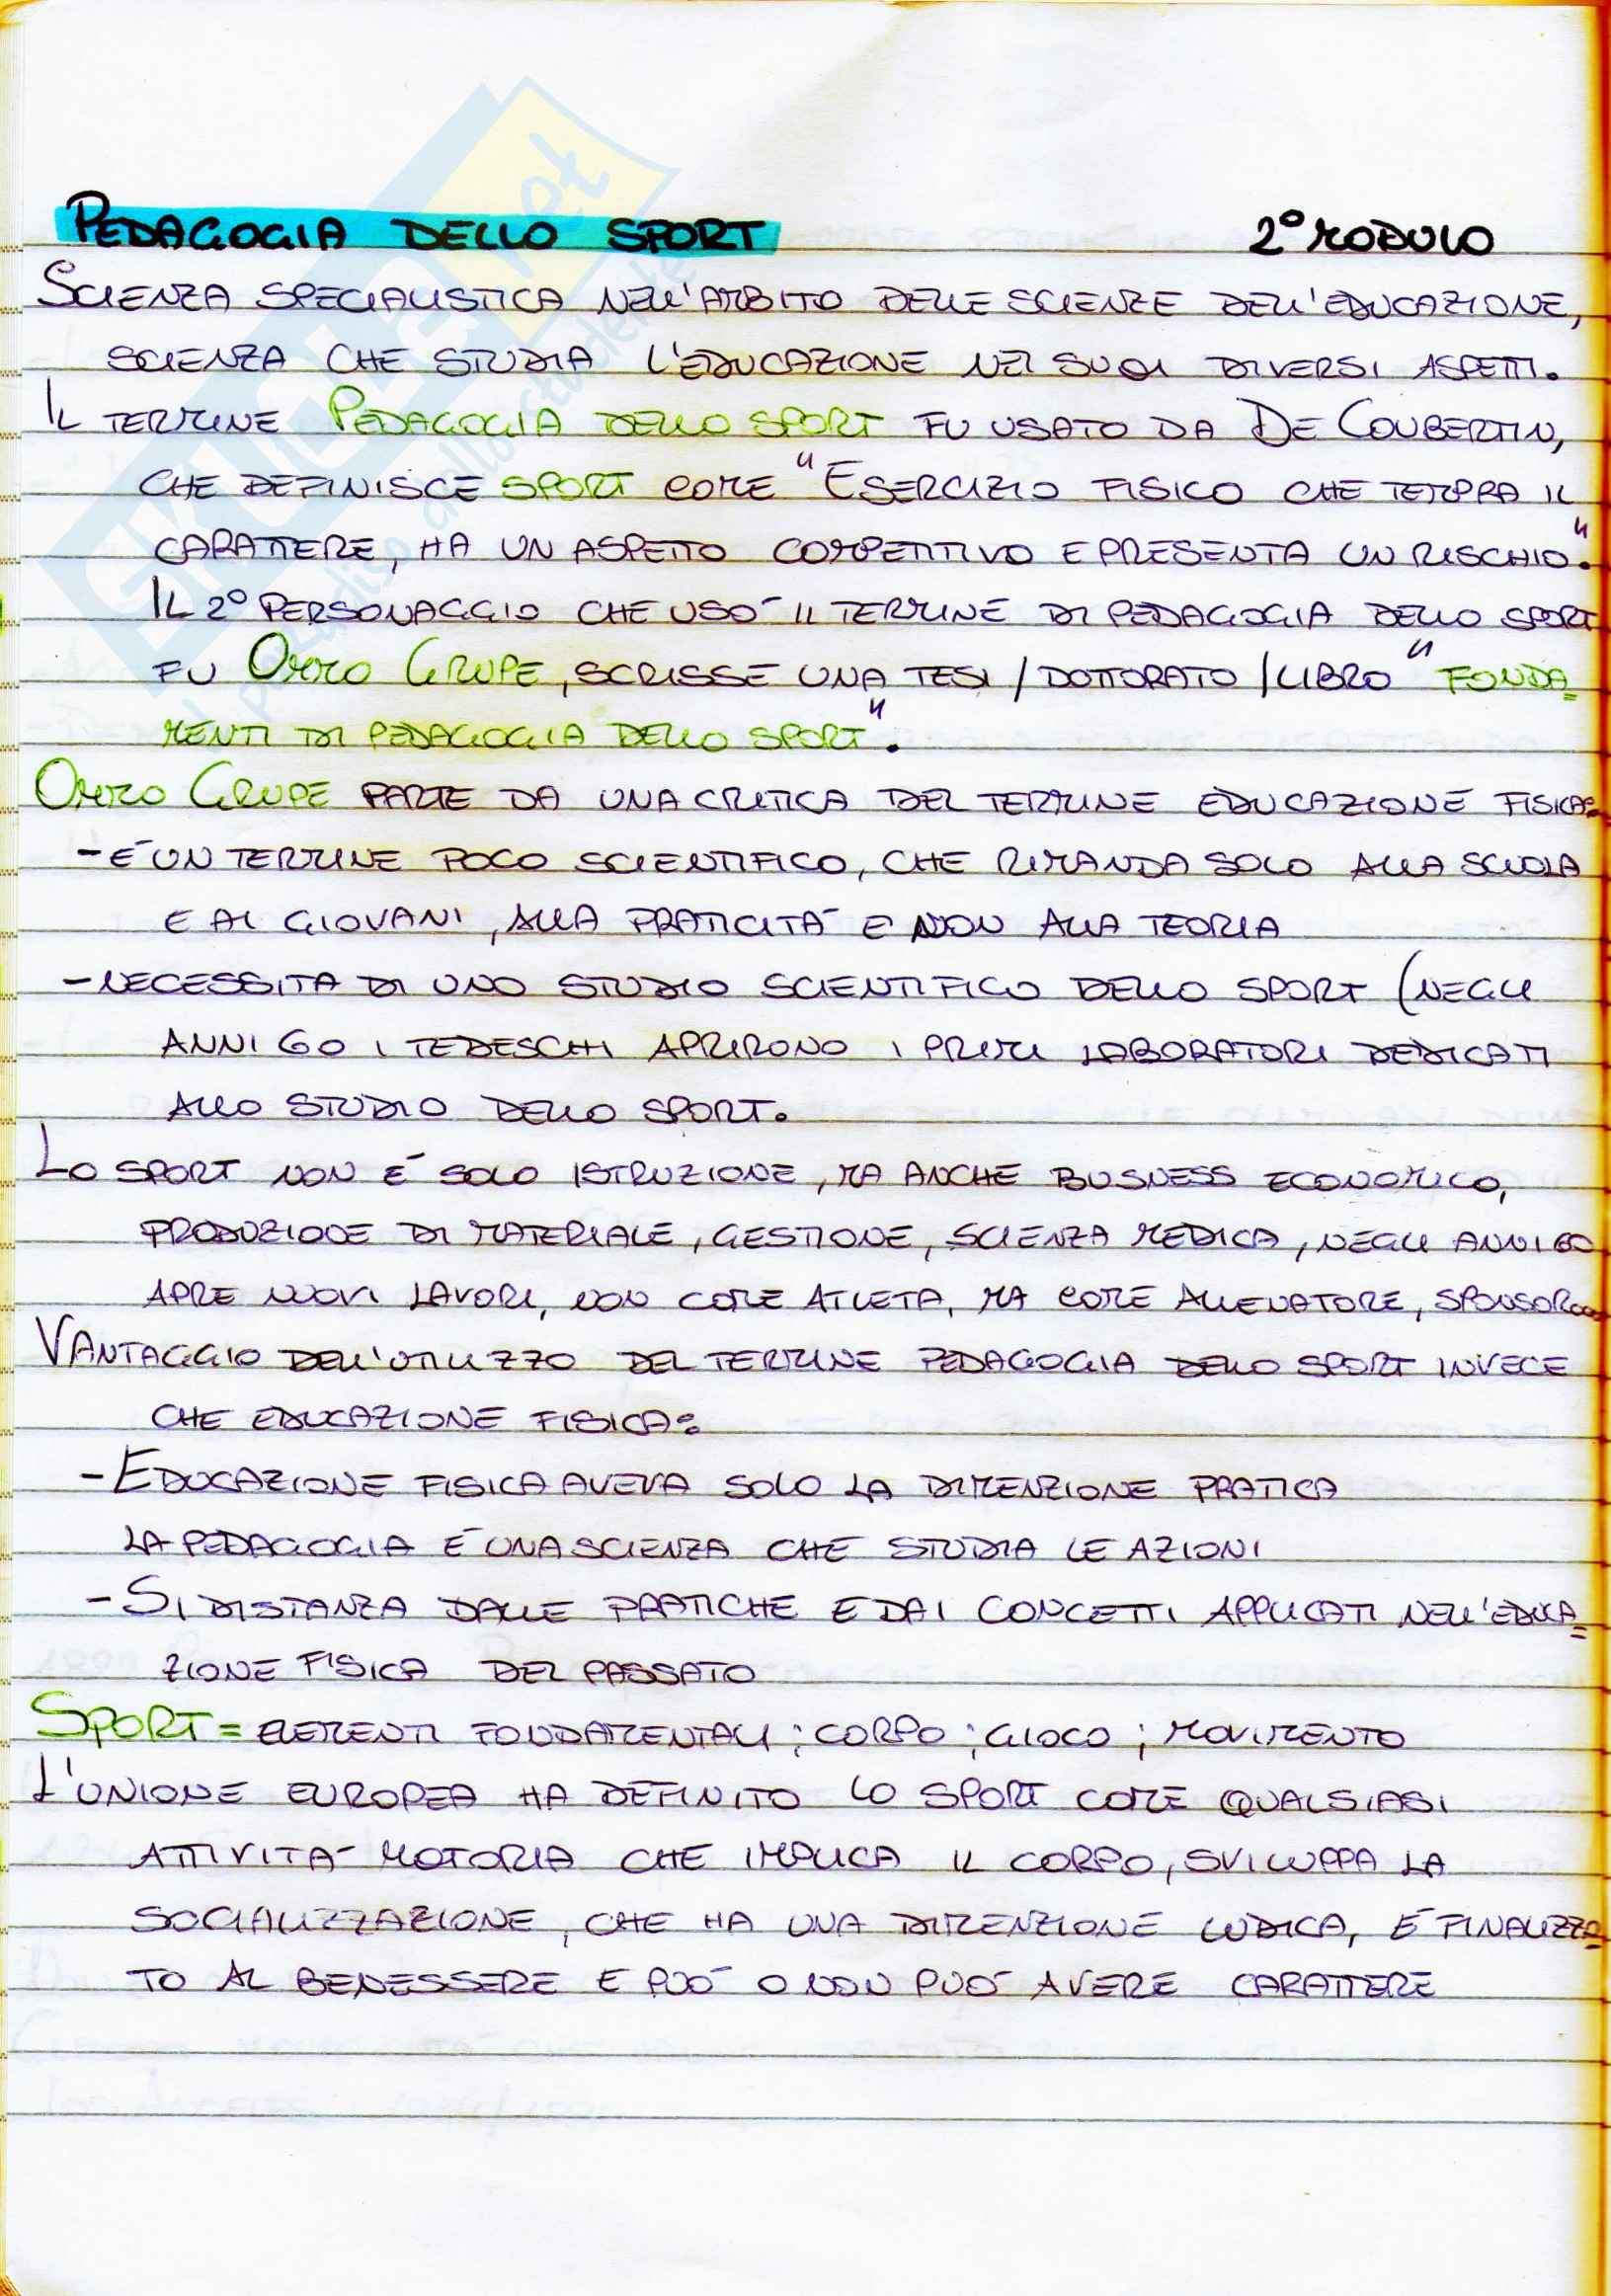 Riassunto esame Pedagogia dello sport, prof. Isidori, libro consigliato La pedagogia dello sport